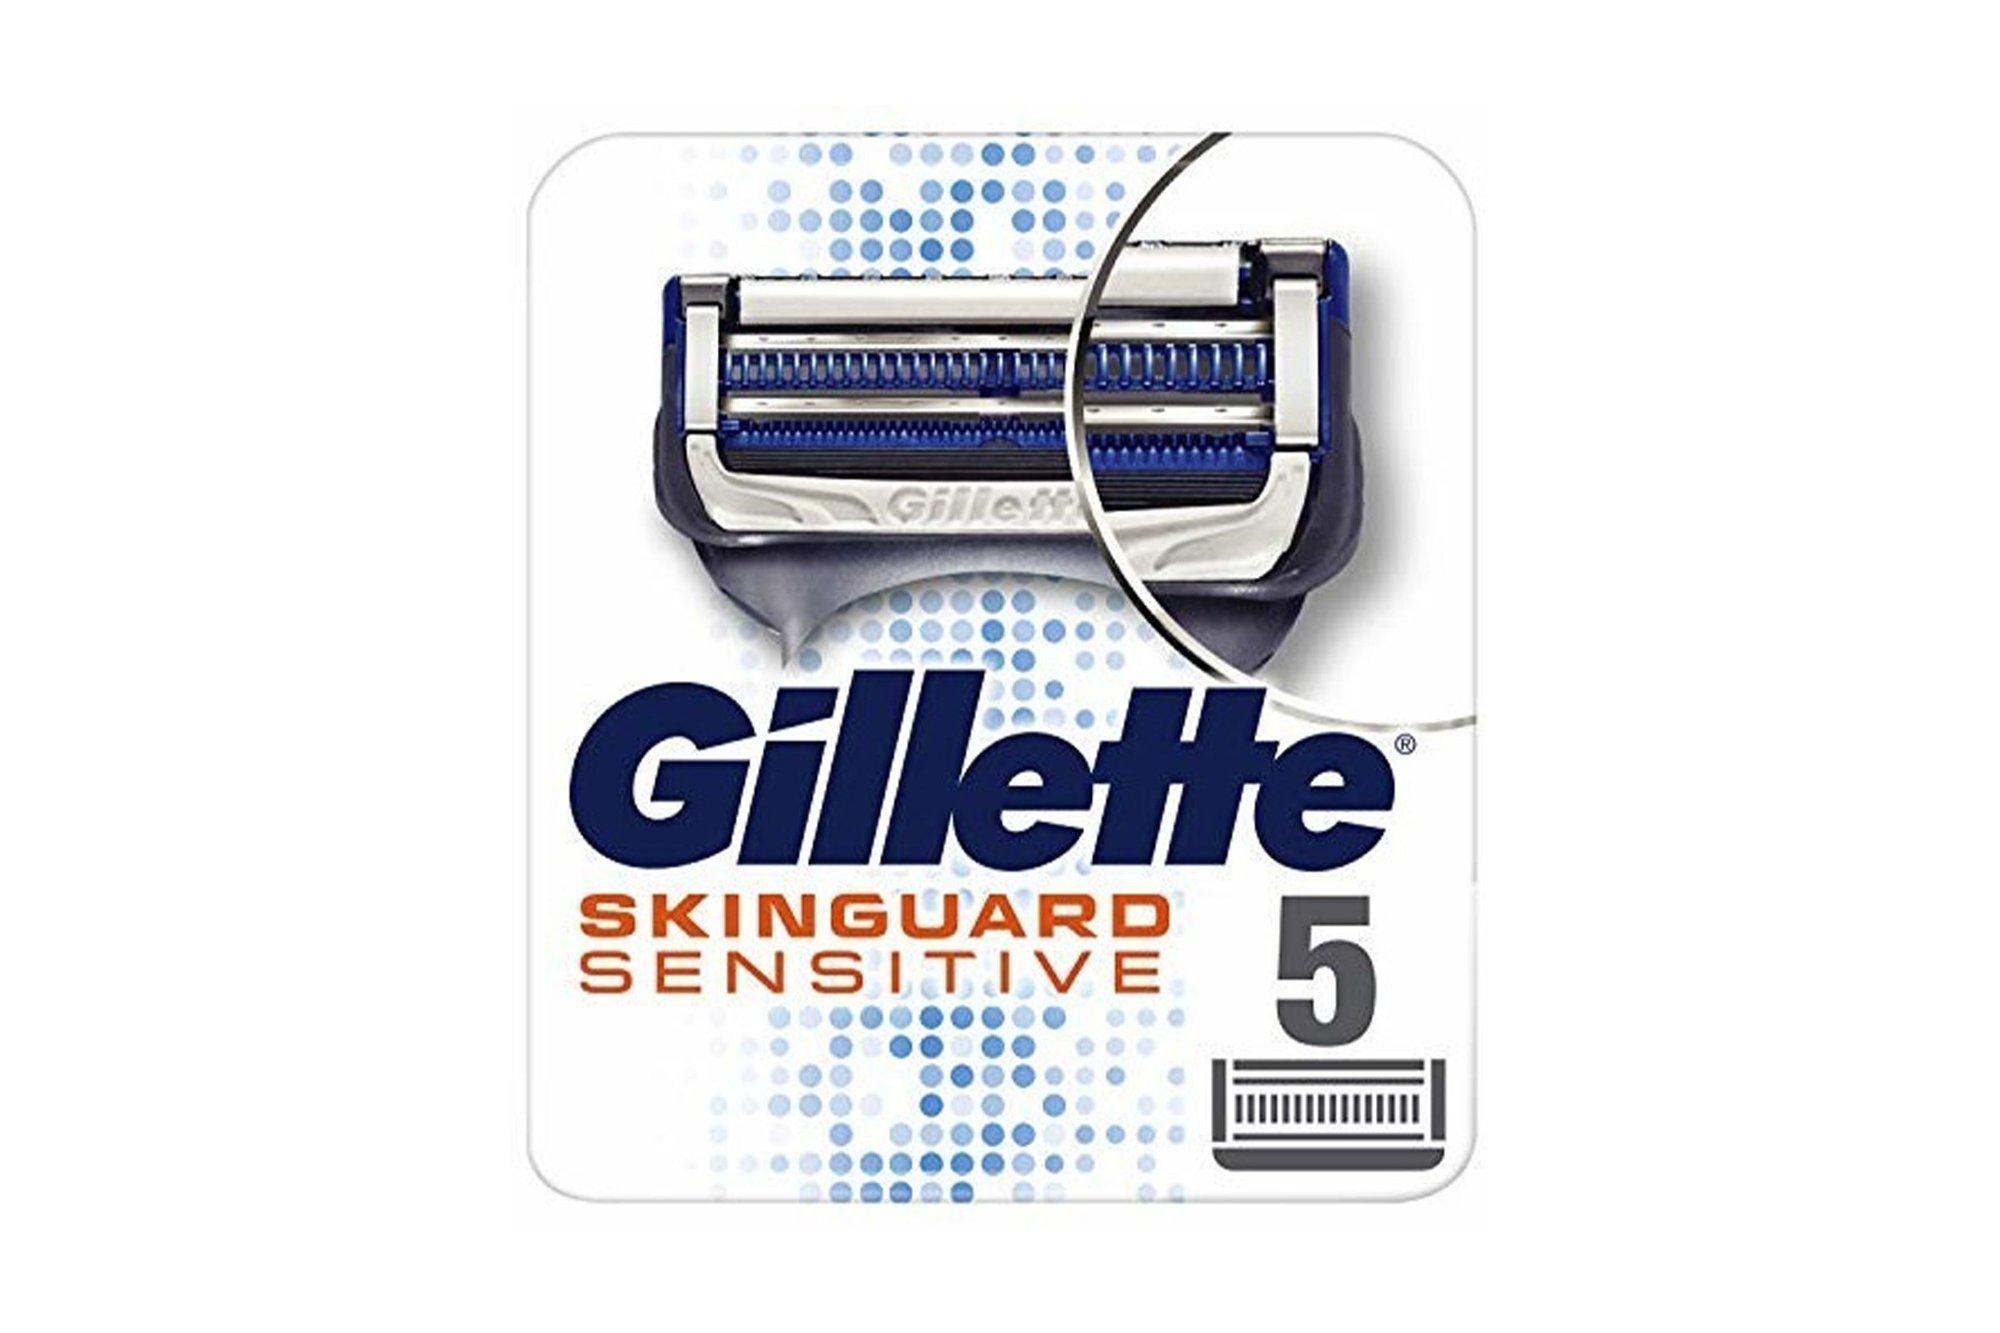 5x Original Ersatzklingen Gillette Skinguard Sensitive